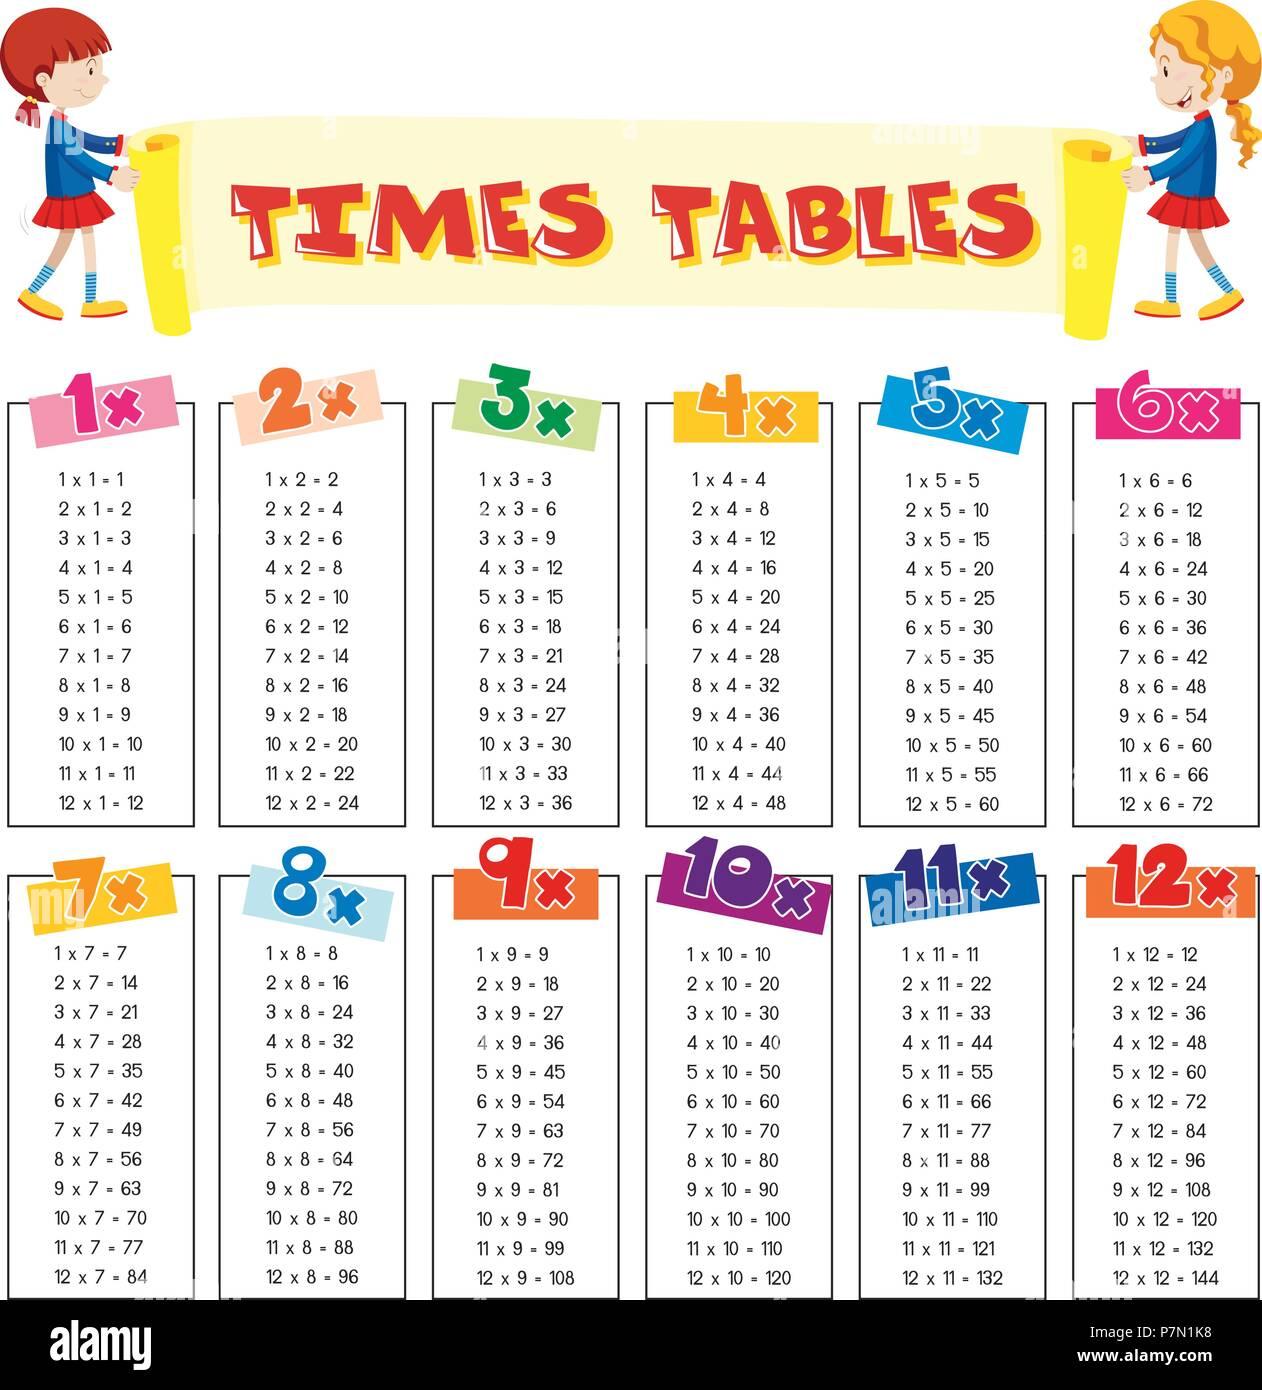 Math Times Tables Sheet Illustration Stock Vector Art